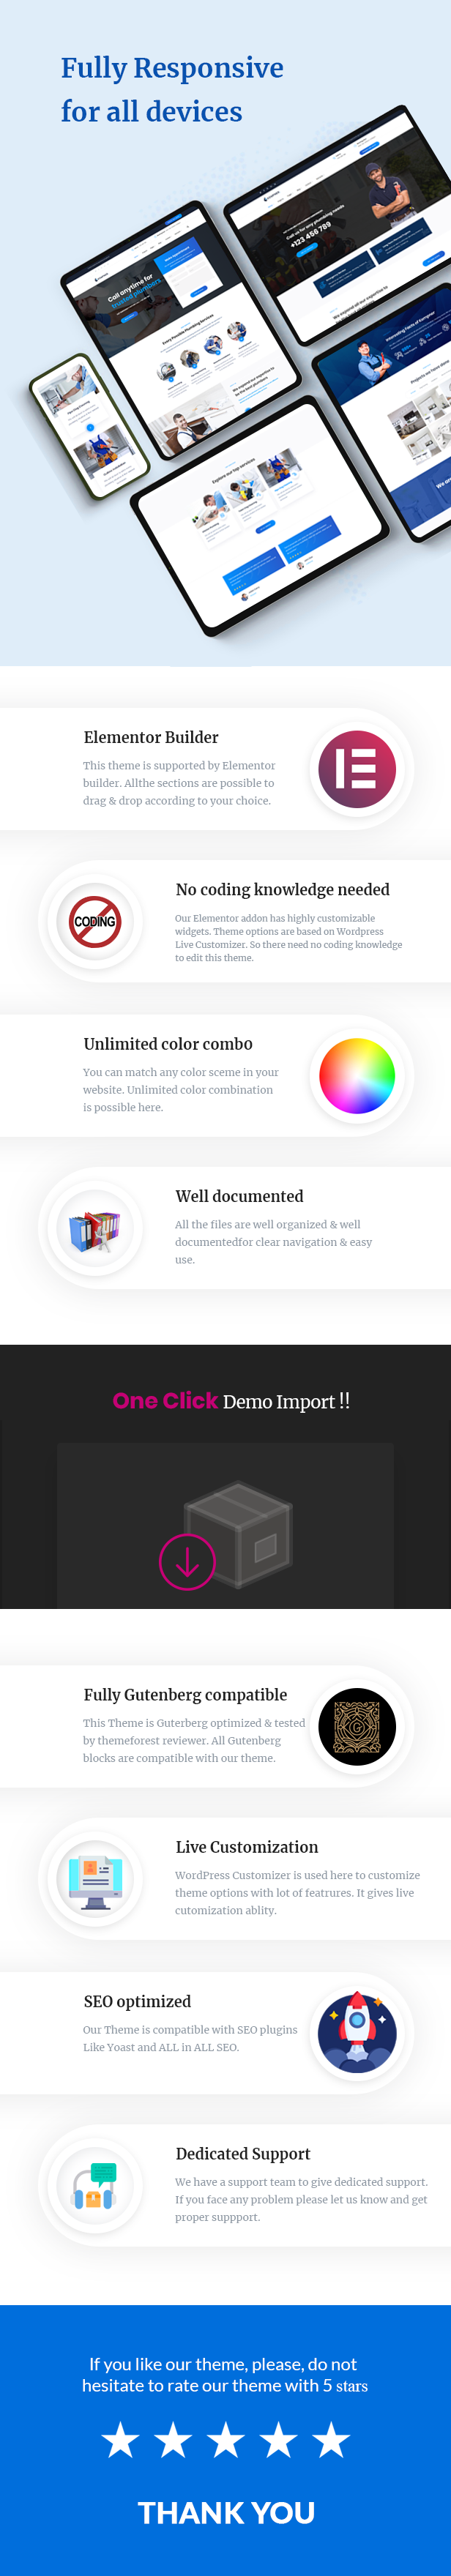 Kempner - Plumber WordPress Theme - 3